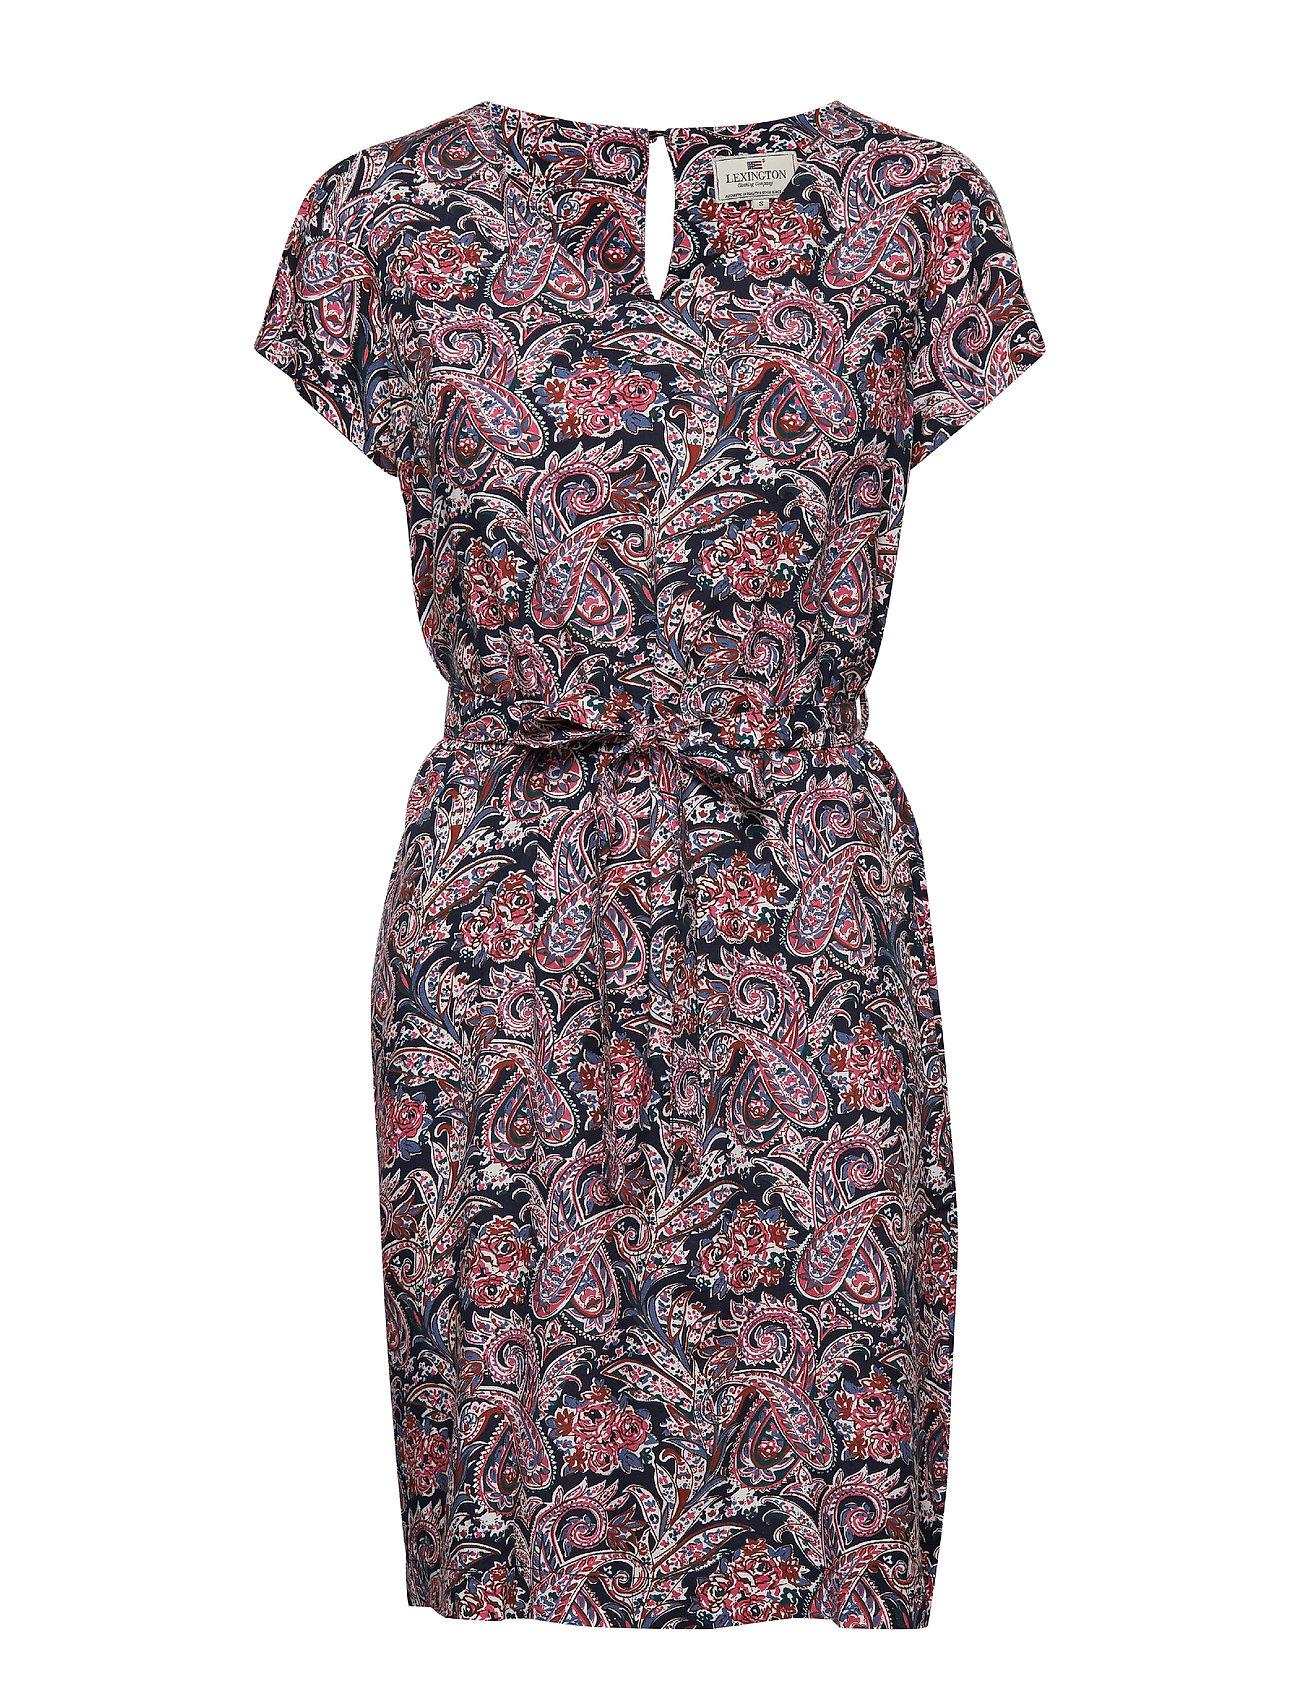 Lexington Clothing Kristina Paisley Dress - PAISLEY PRINT